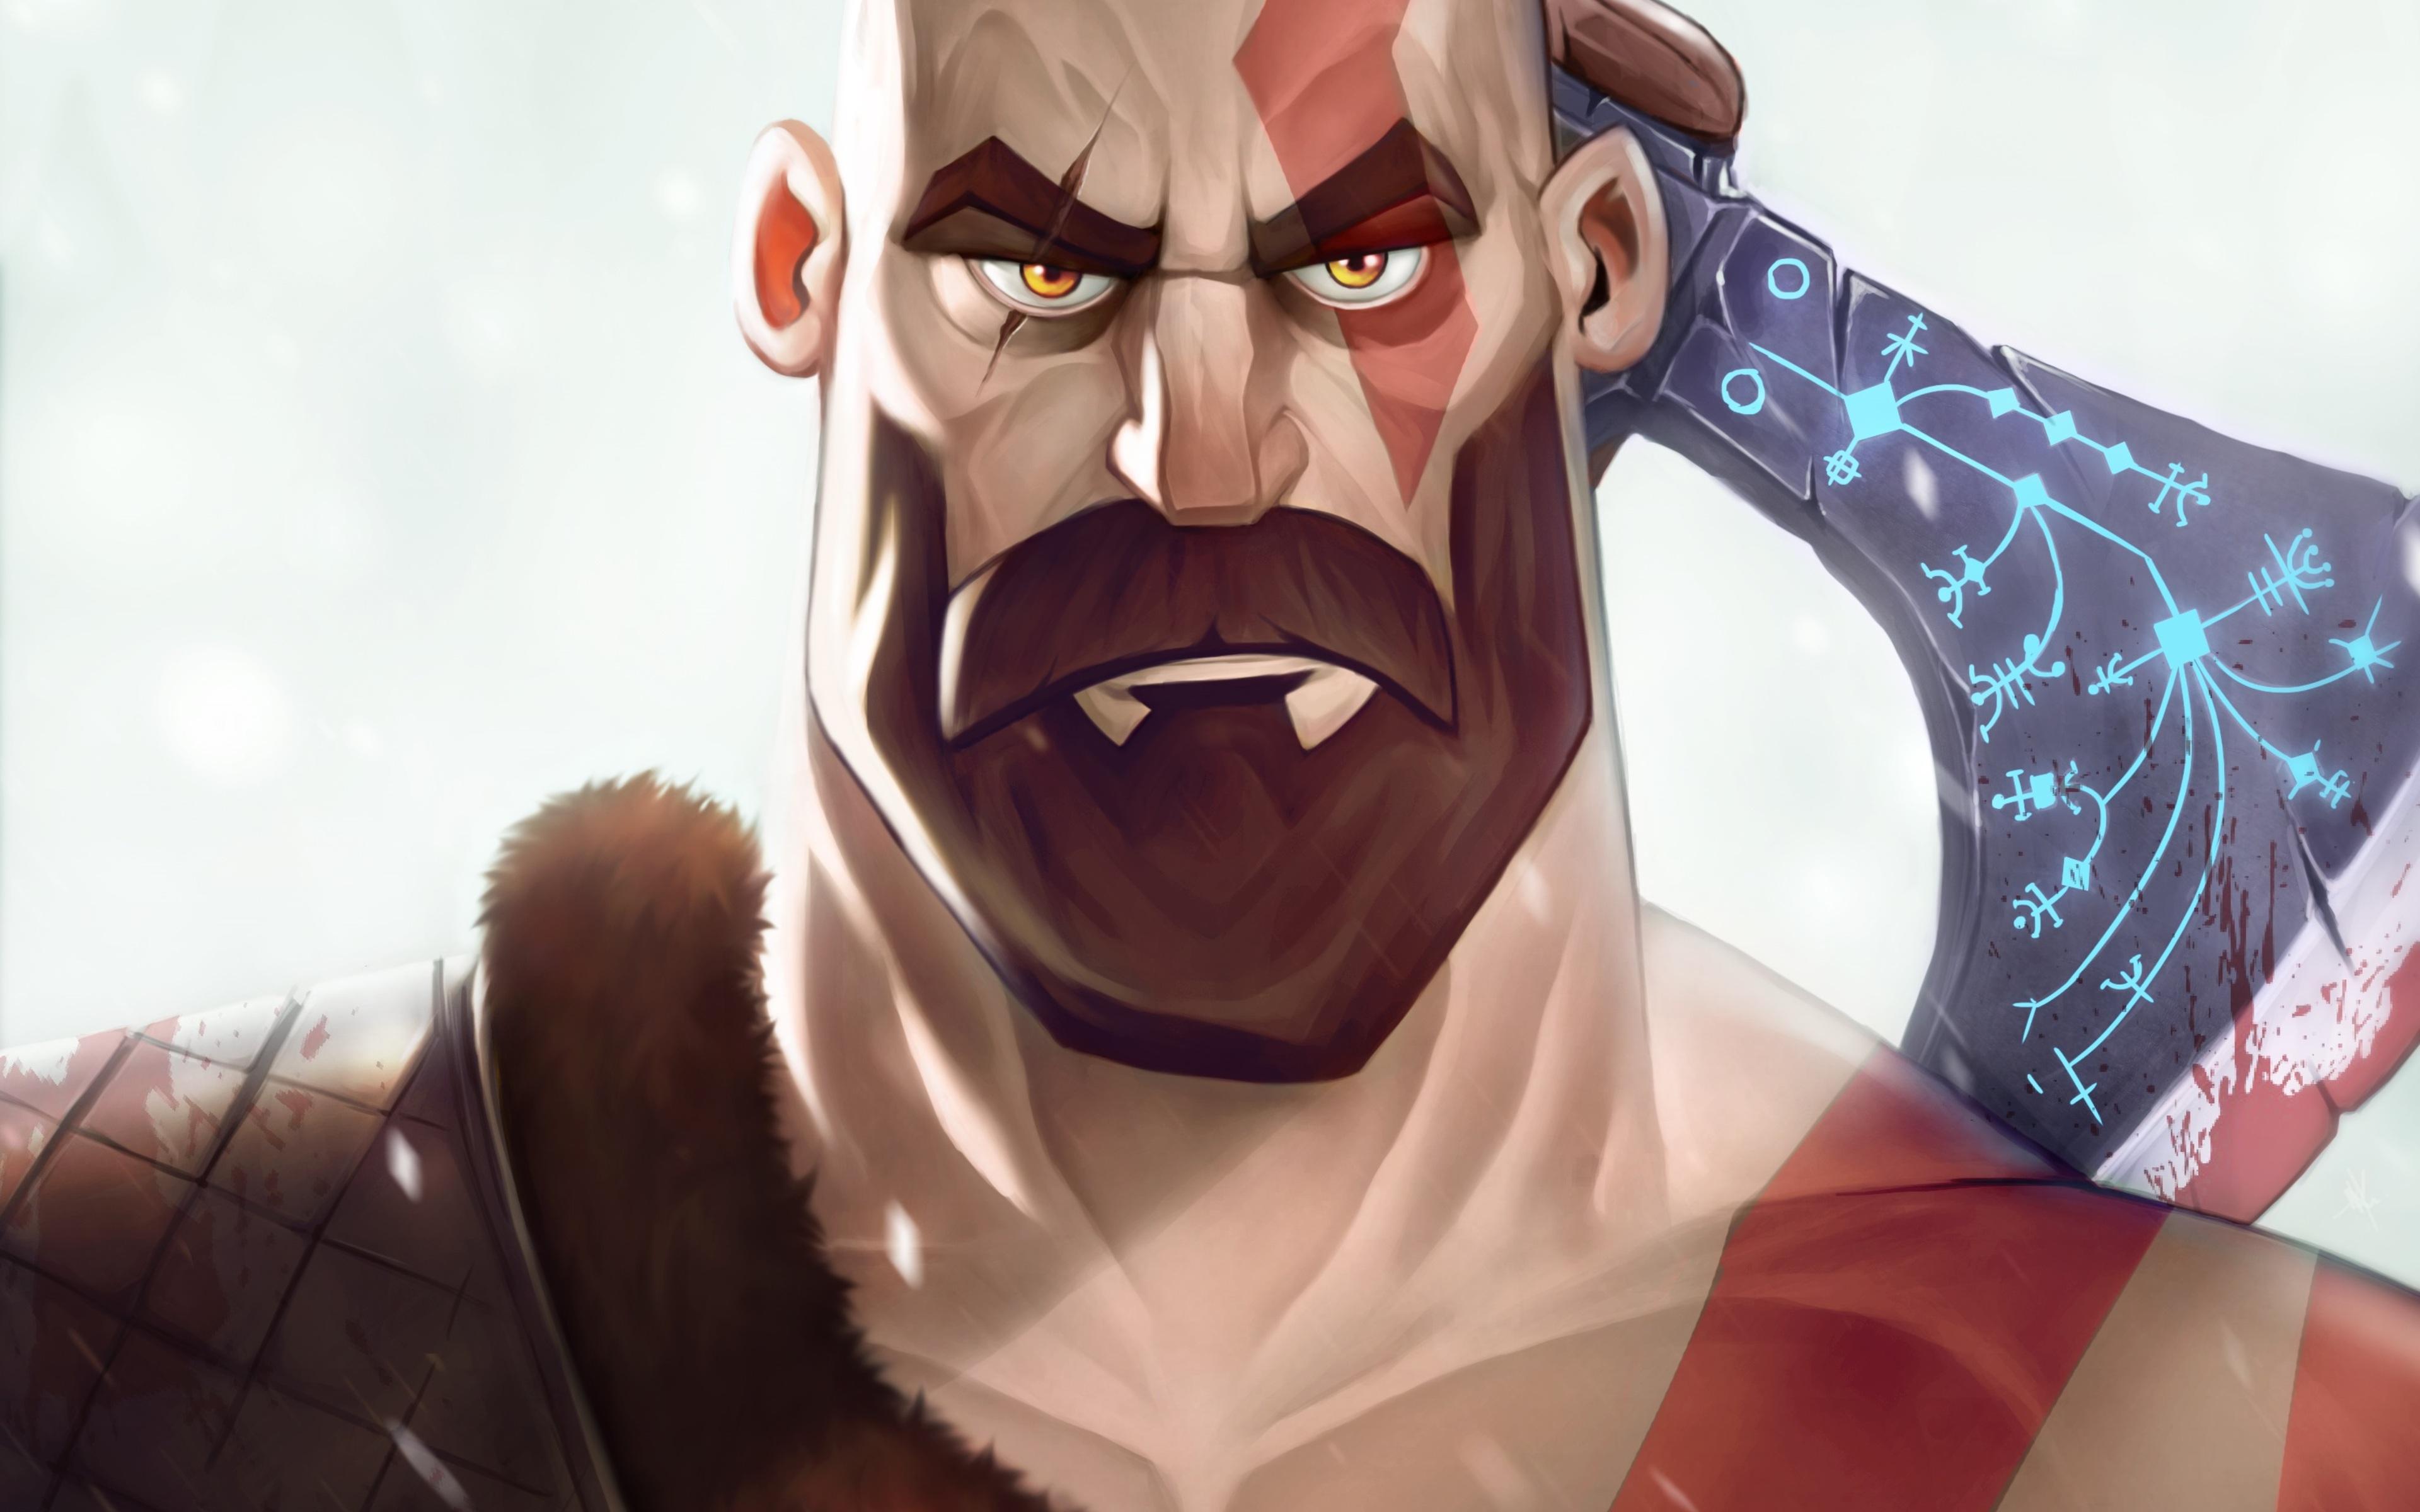 kratos-new-art-zq.jpg